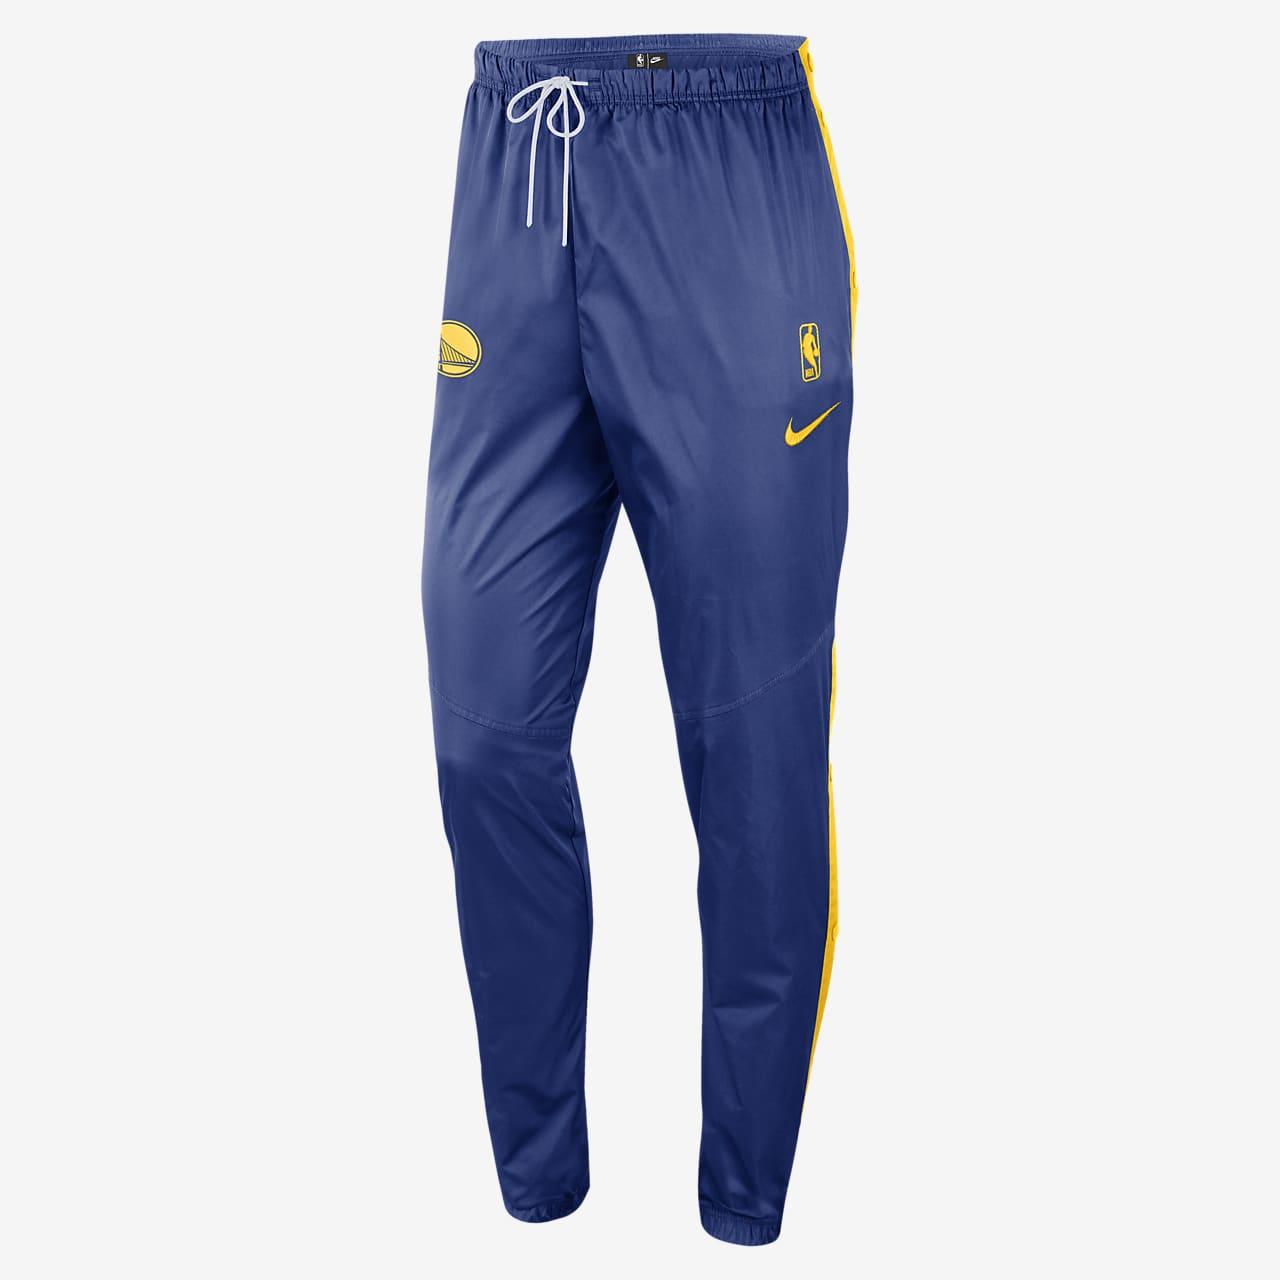 Pantalones de la NBA para mujer Golden State Warriors Nike